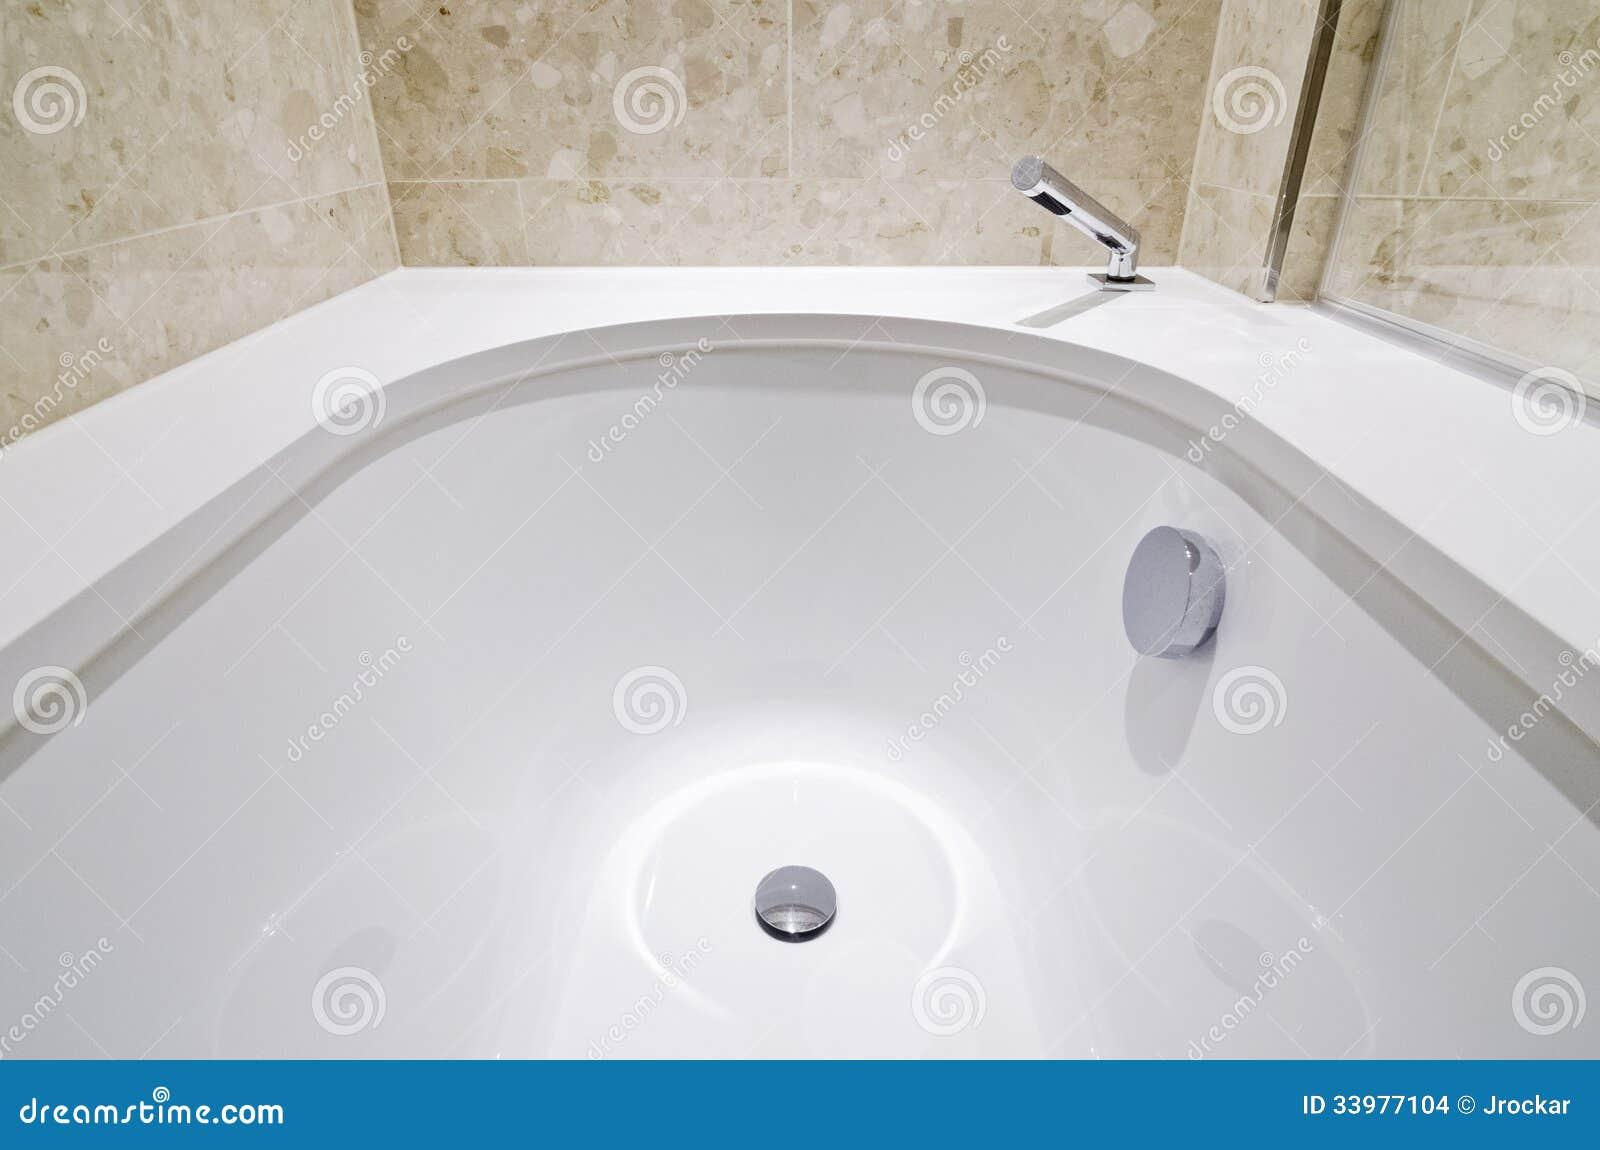 Vasca Da Bagno Ergonomica : Vasche da bagno piccole vasche da bagno vasche da bagno